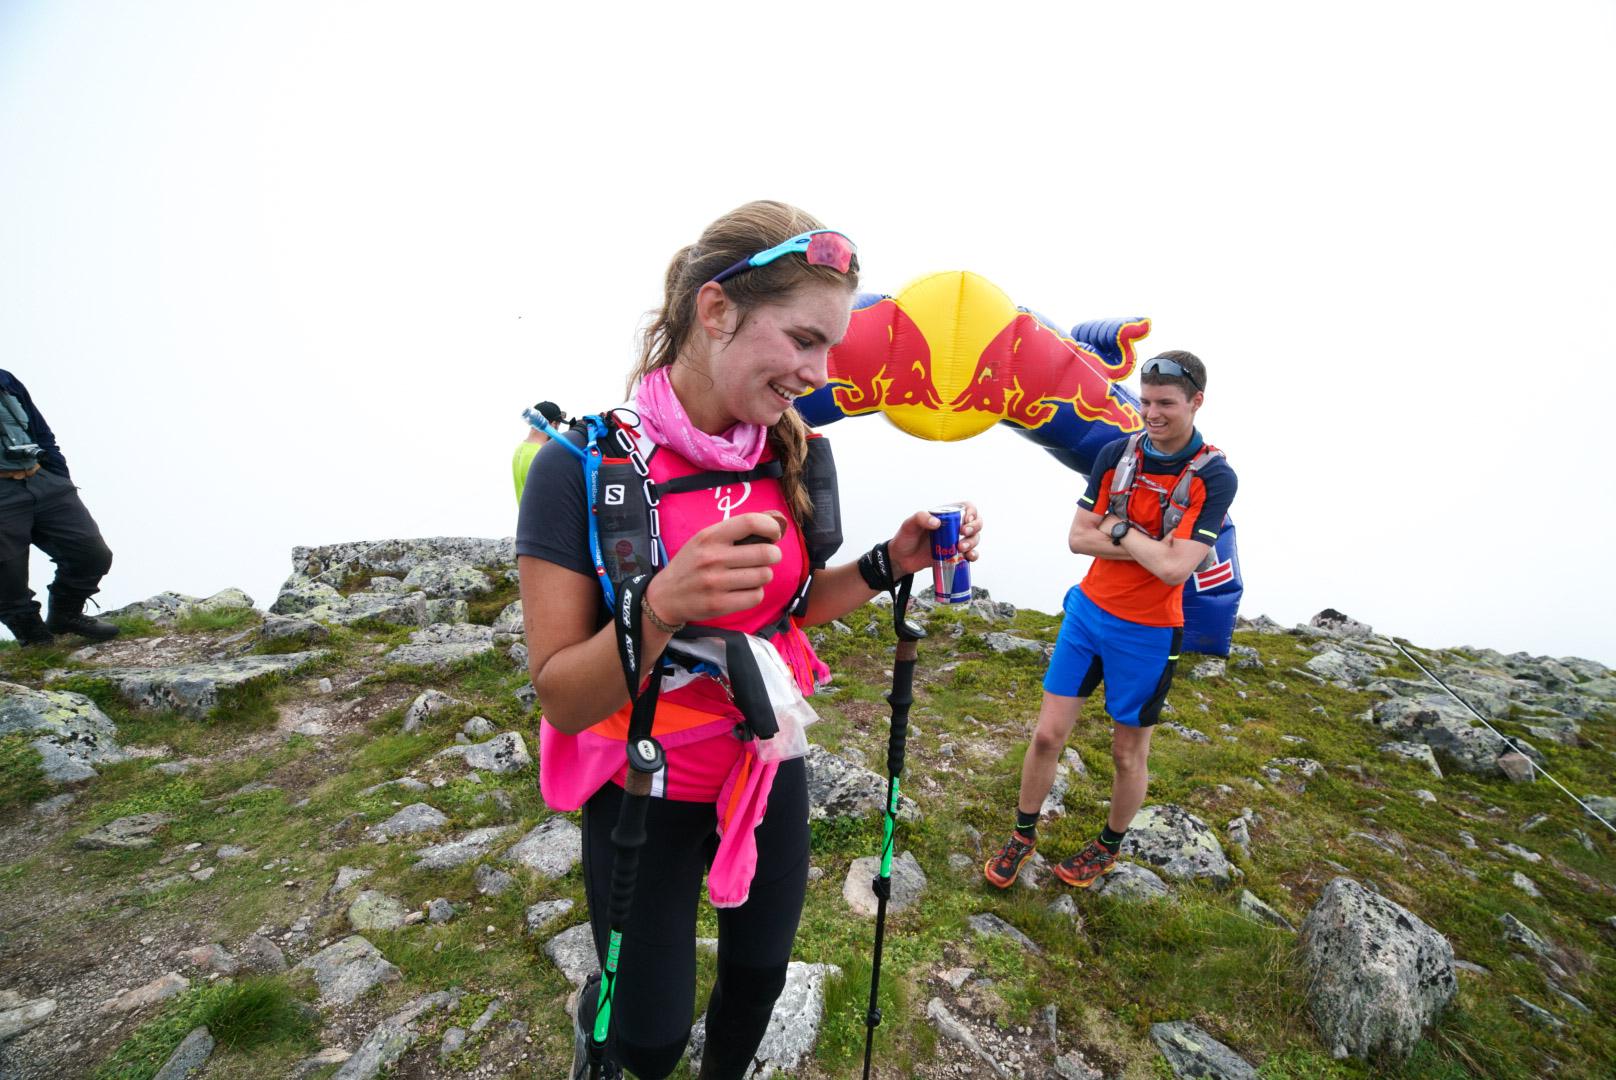 Salomon Xreid 2017_Kristin Helland-Hansen_Winner of the female individual class_Photo_Kyle Meyr.jpg